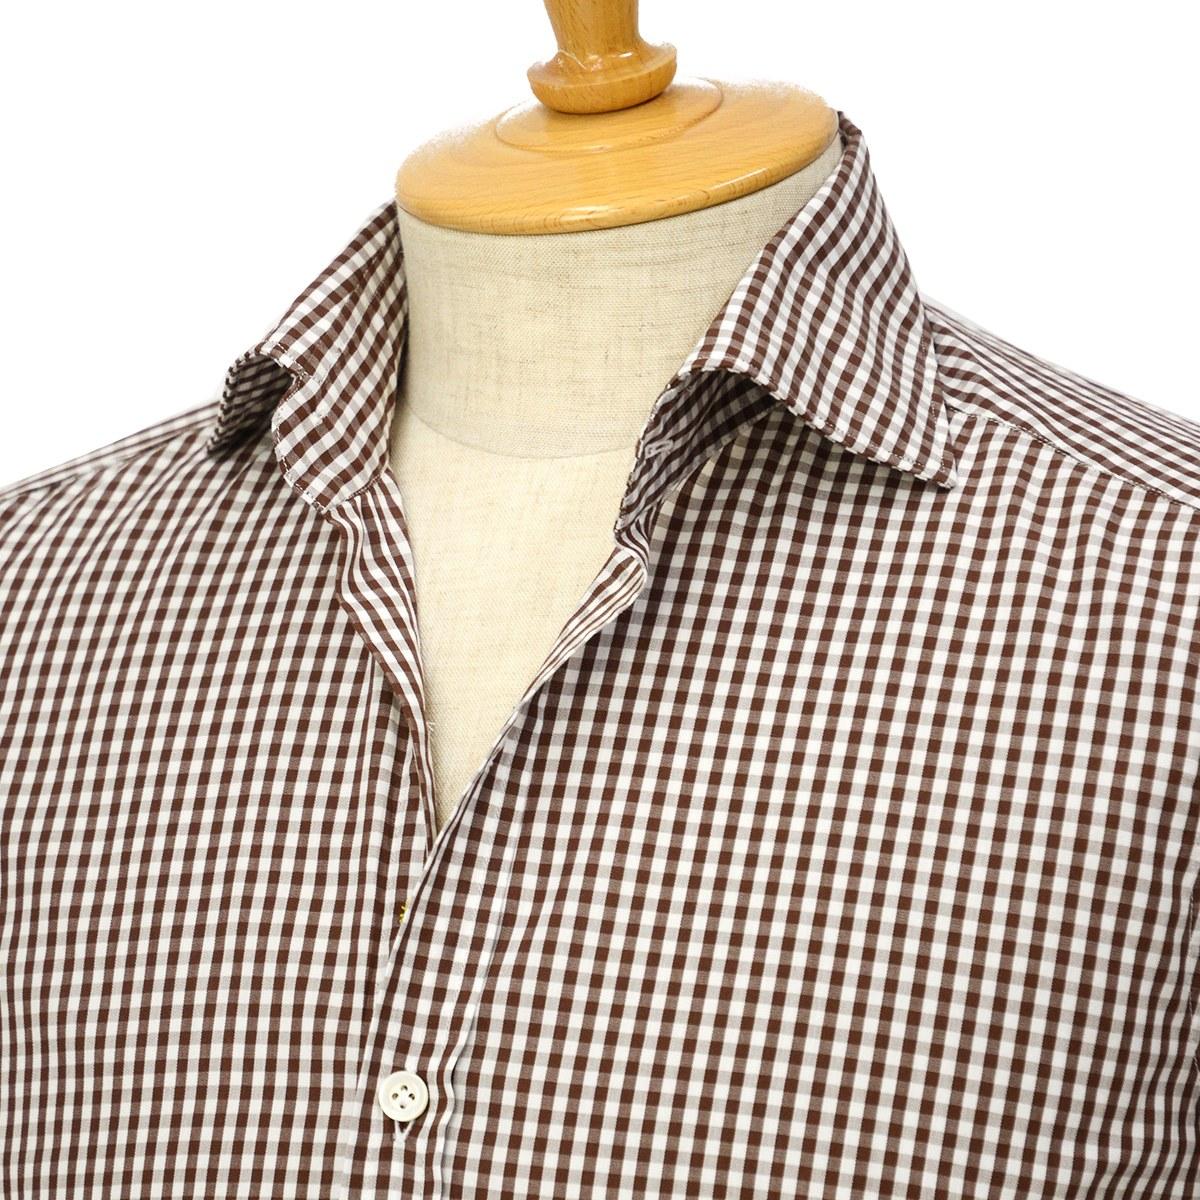 【30%OFF】【size36,38】Giannetto【ジャンネット】ギンガムチェックシャツ VINCIFIT 26837V81 004 コットン ブラウン